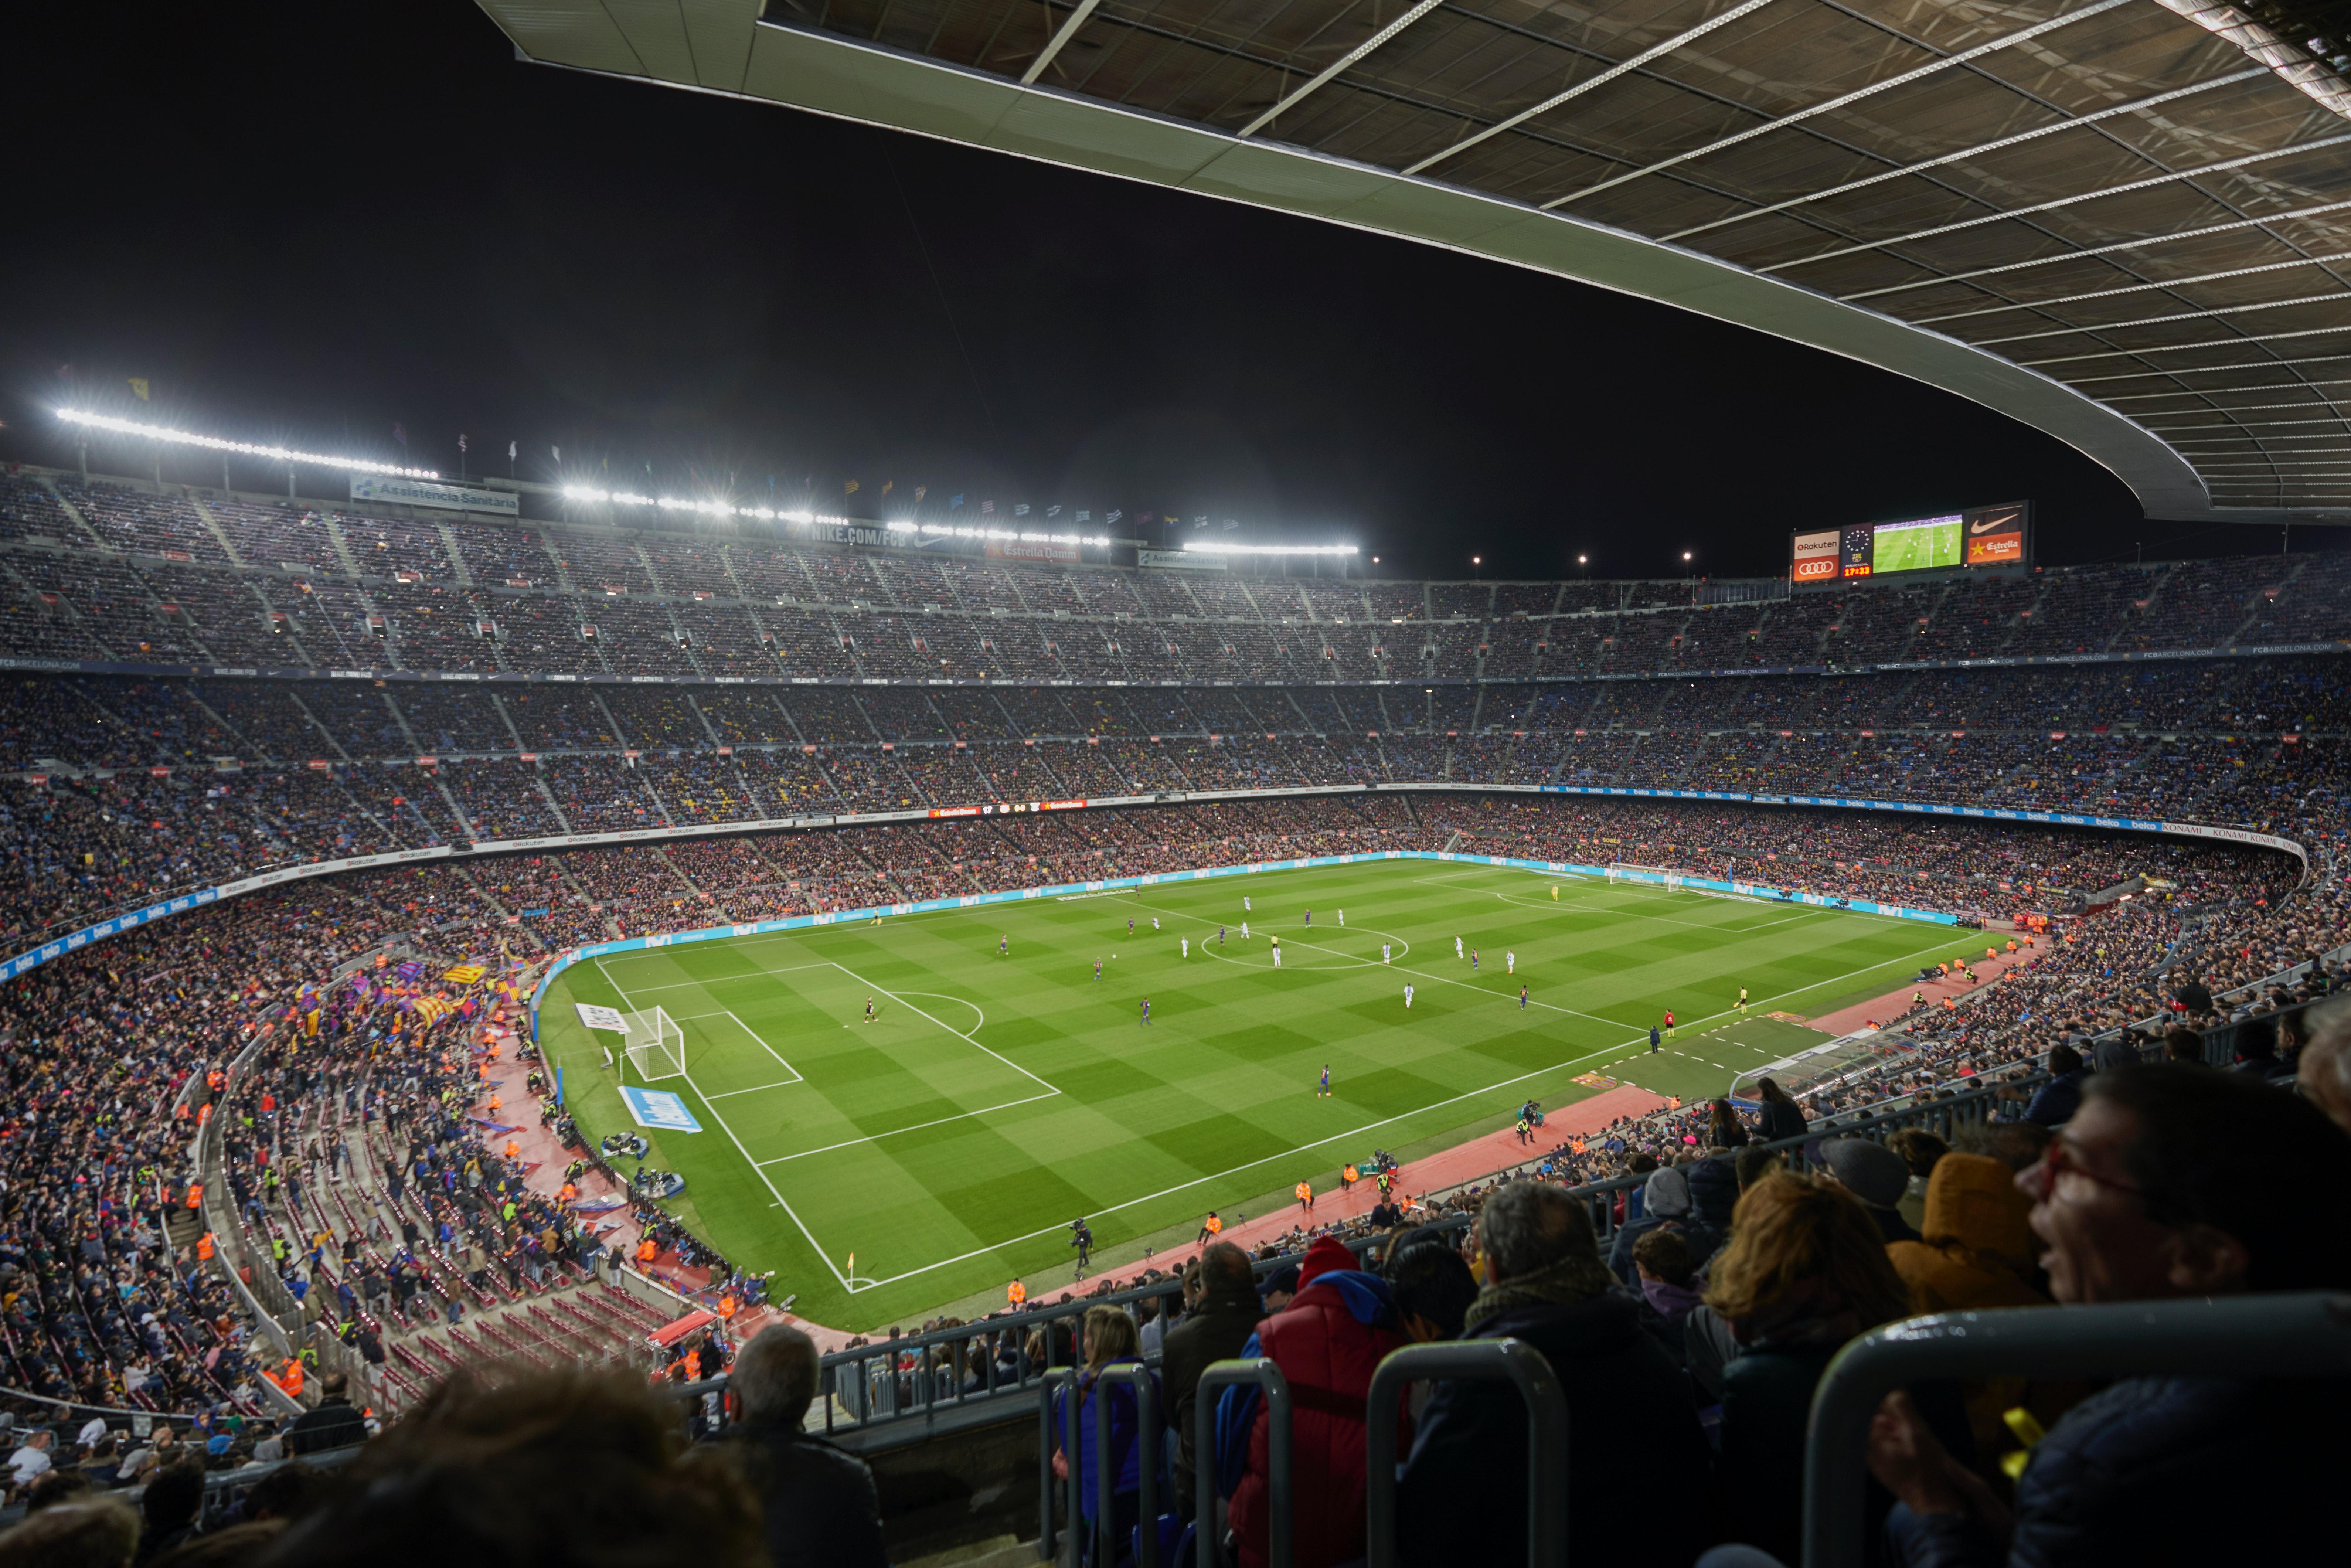 Fcバルセロナ カンプノウの無料の写真素材